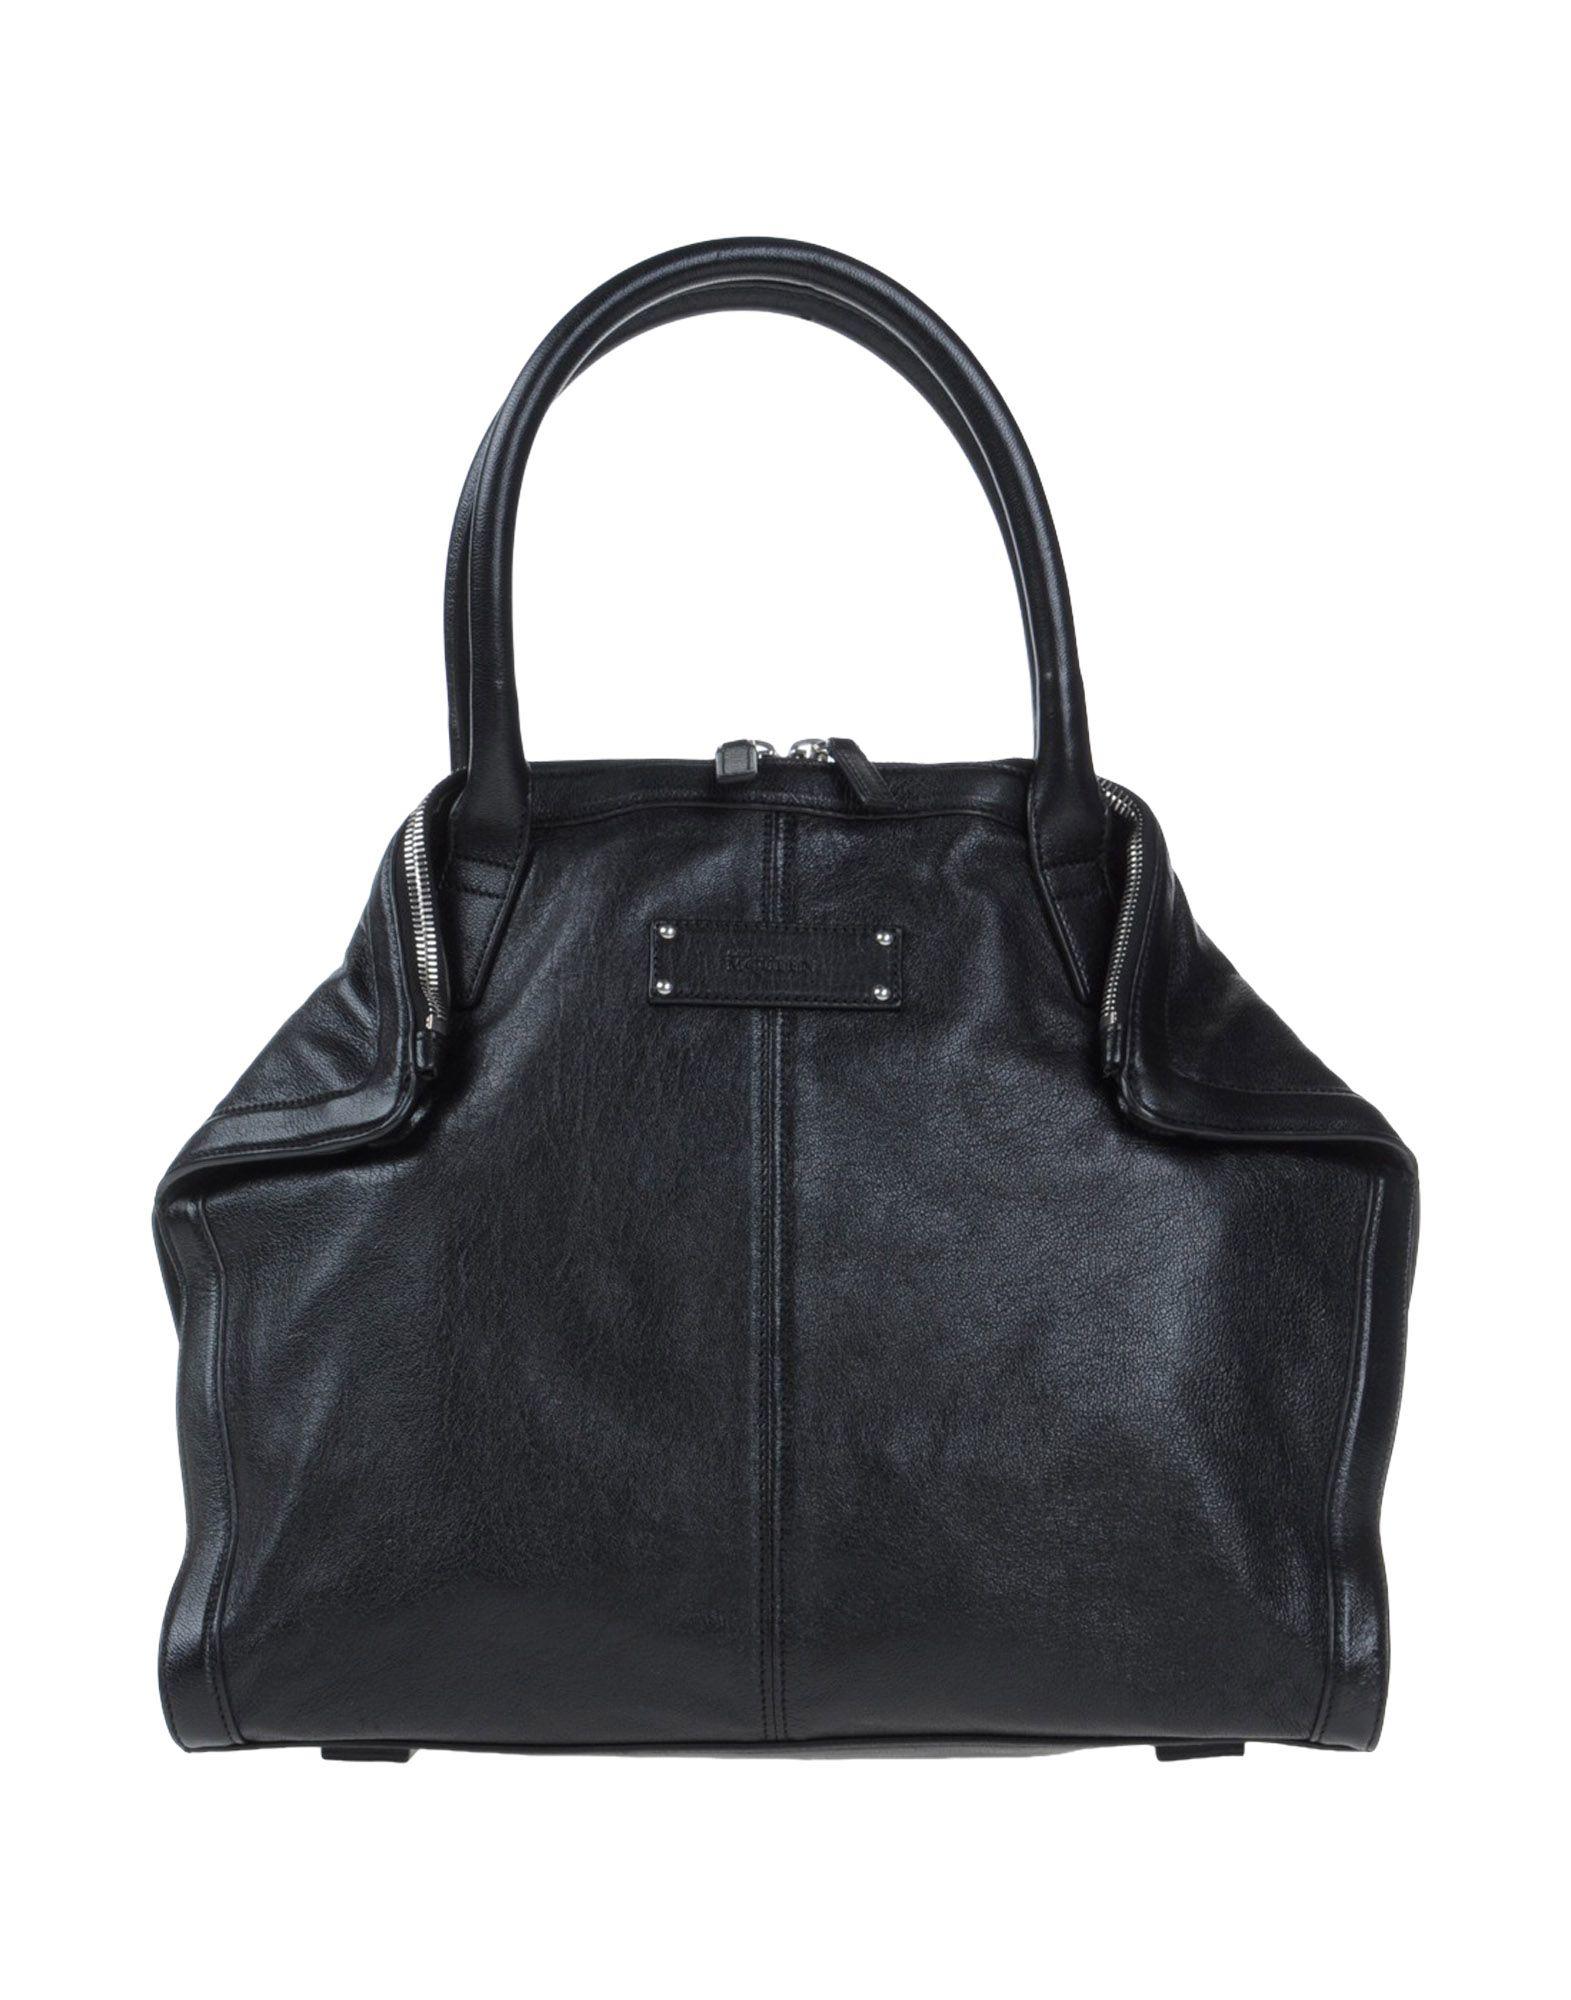 Lyst - Alexander Mcqueen Handbag in Black